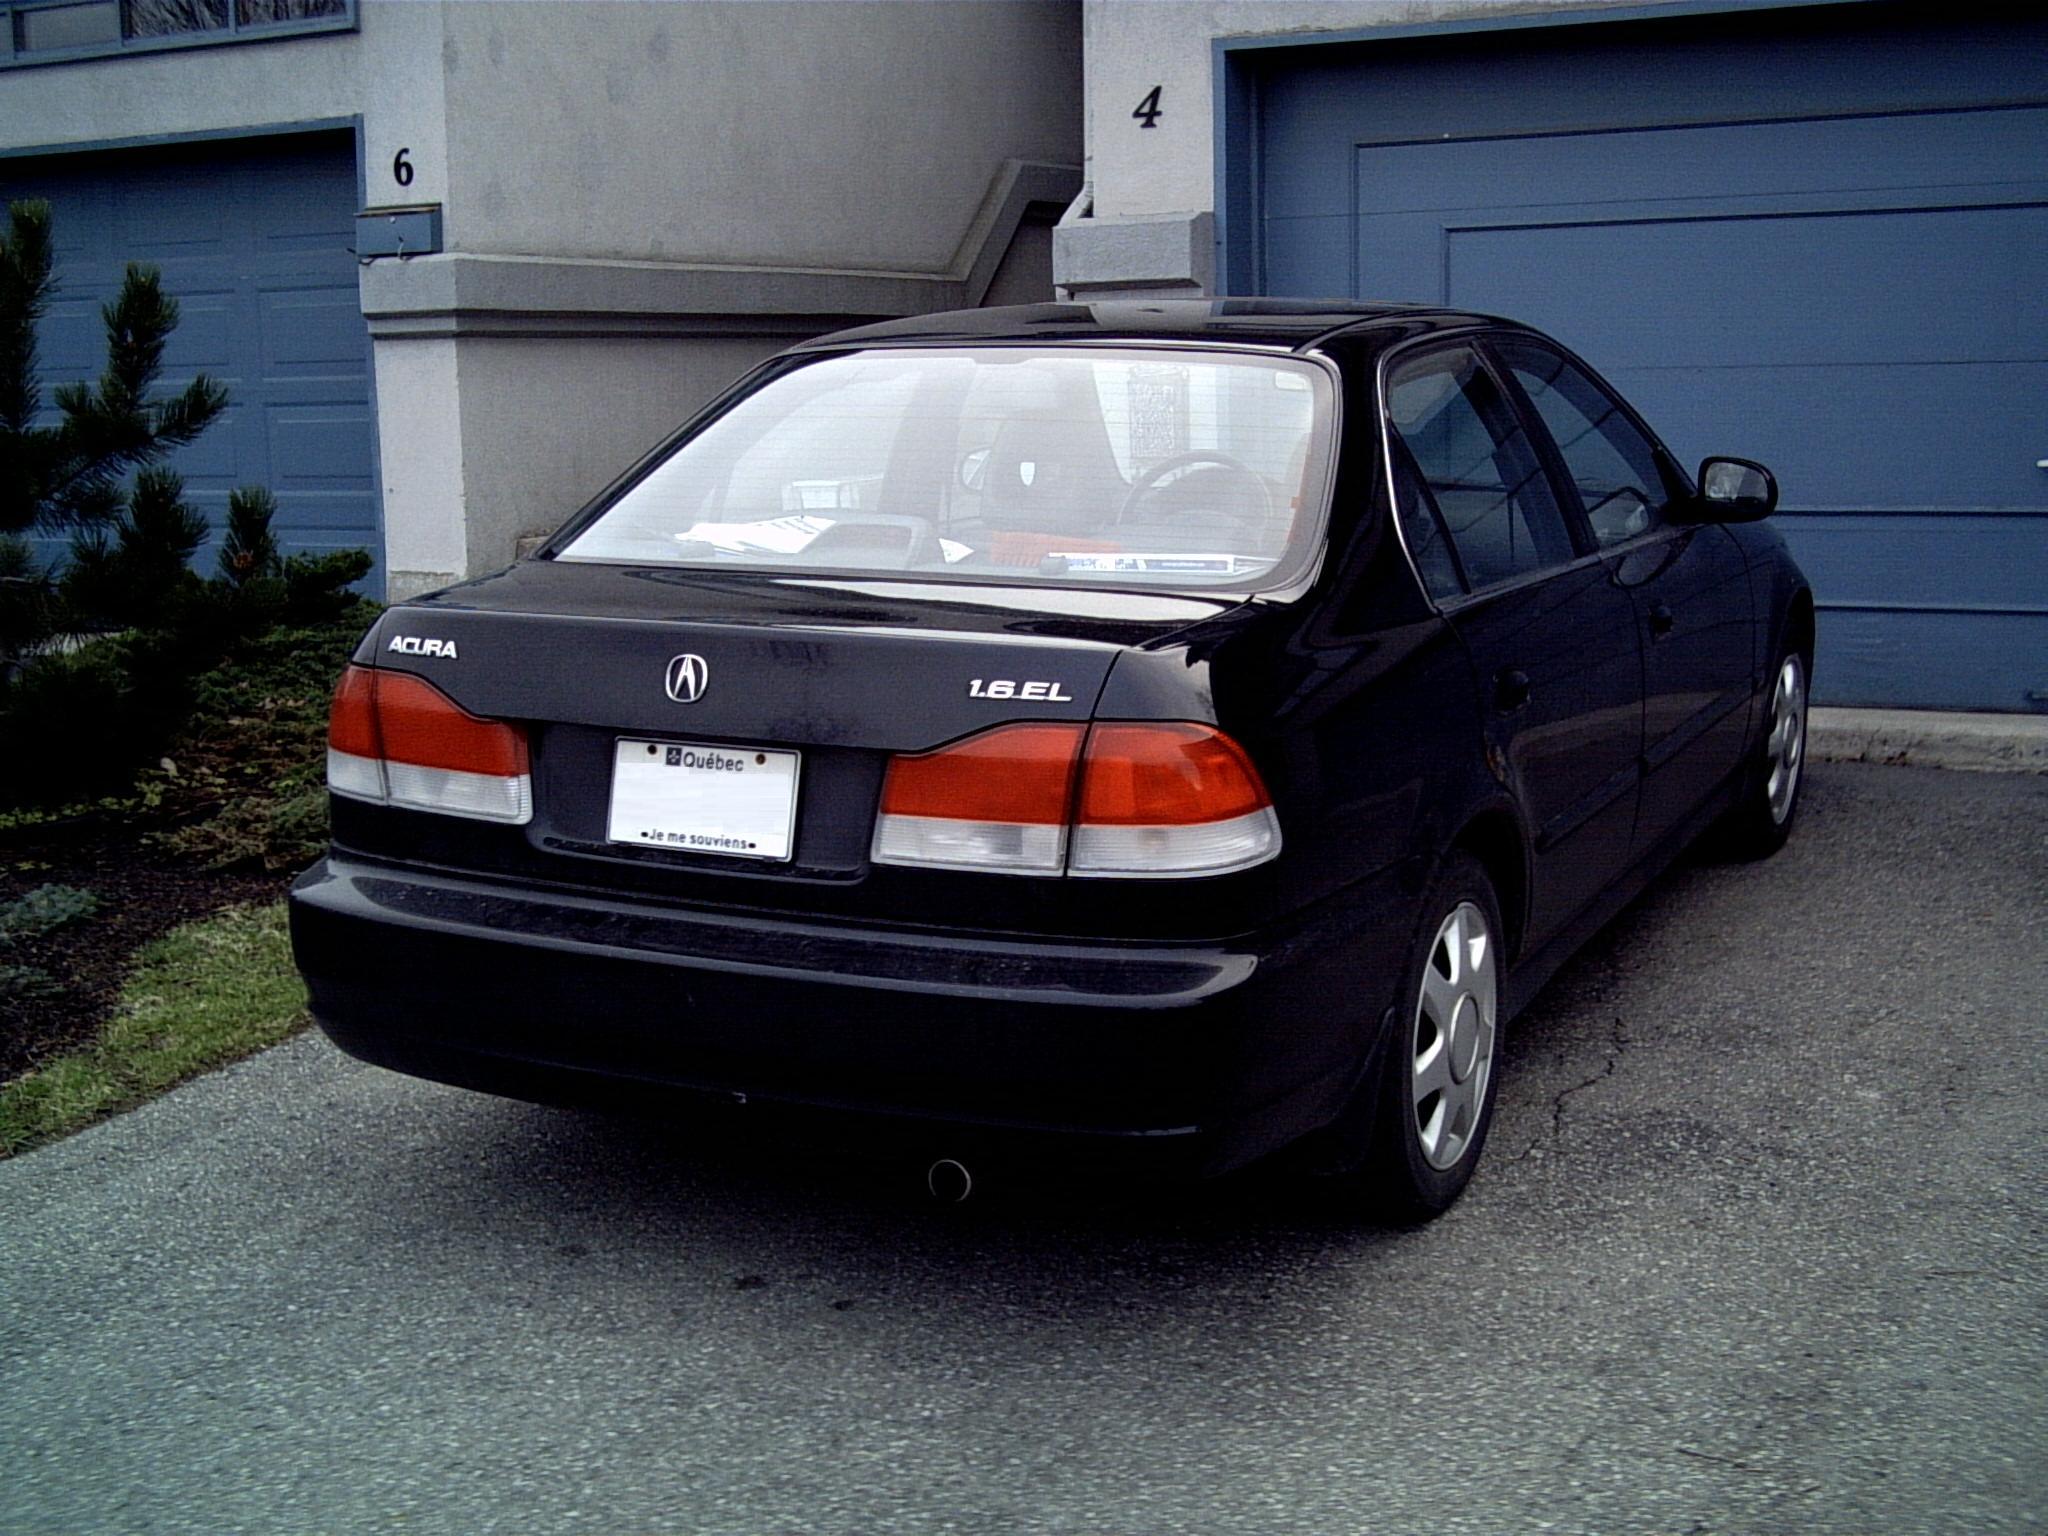 File:Acura EL (1997-2000).JPG - Wikimedia Commons